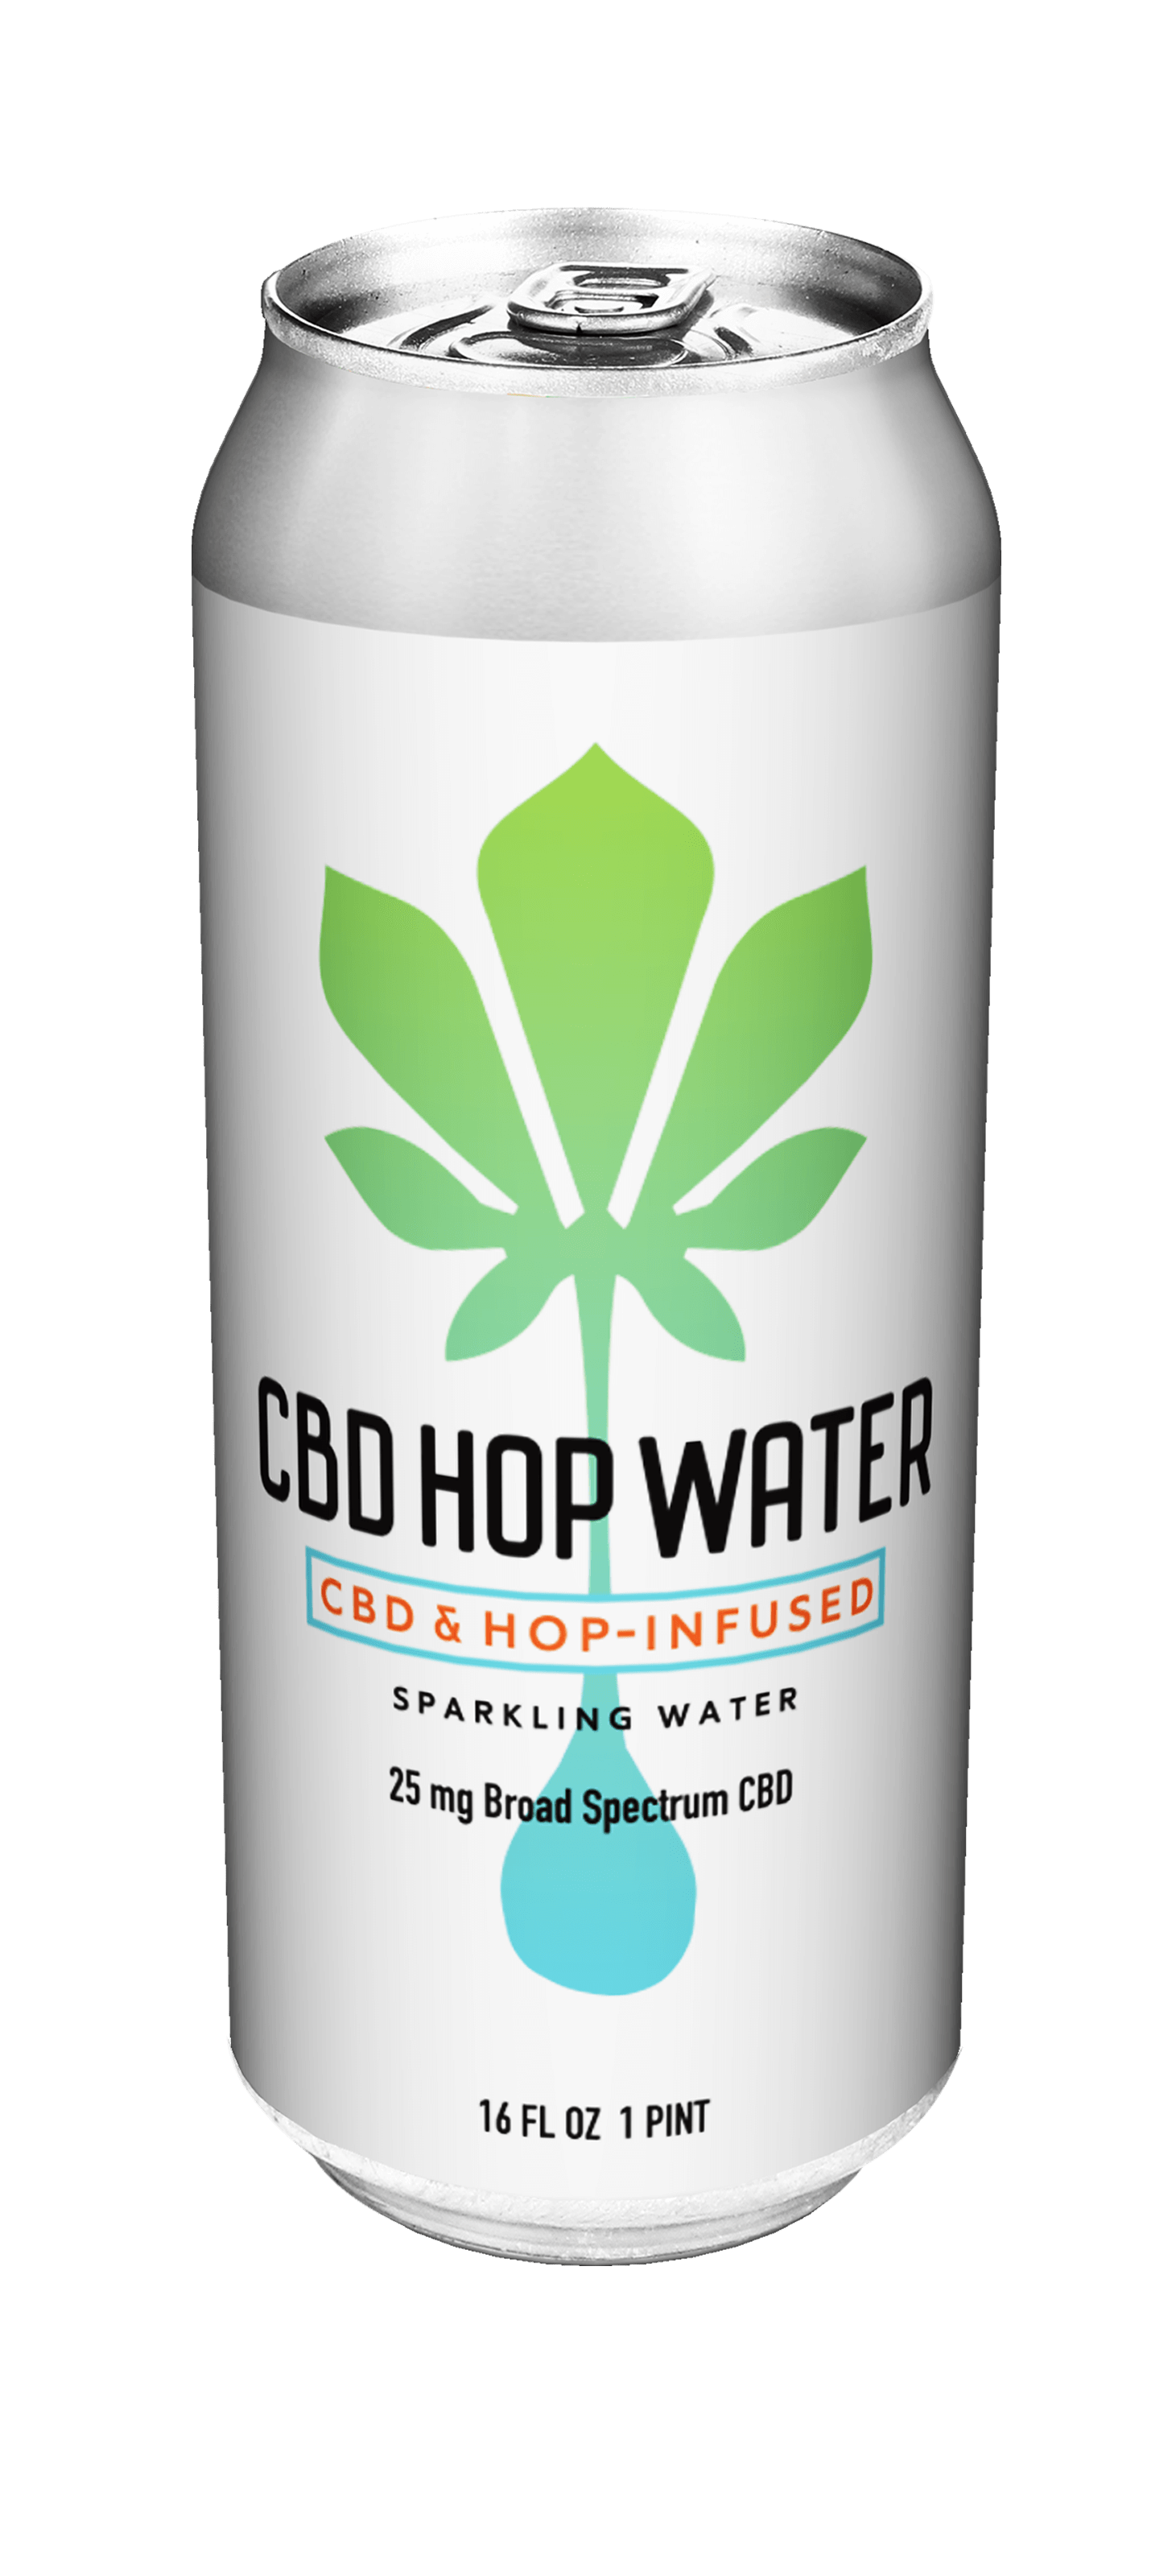 CBD Hop Water